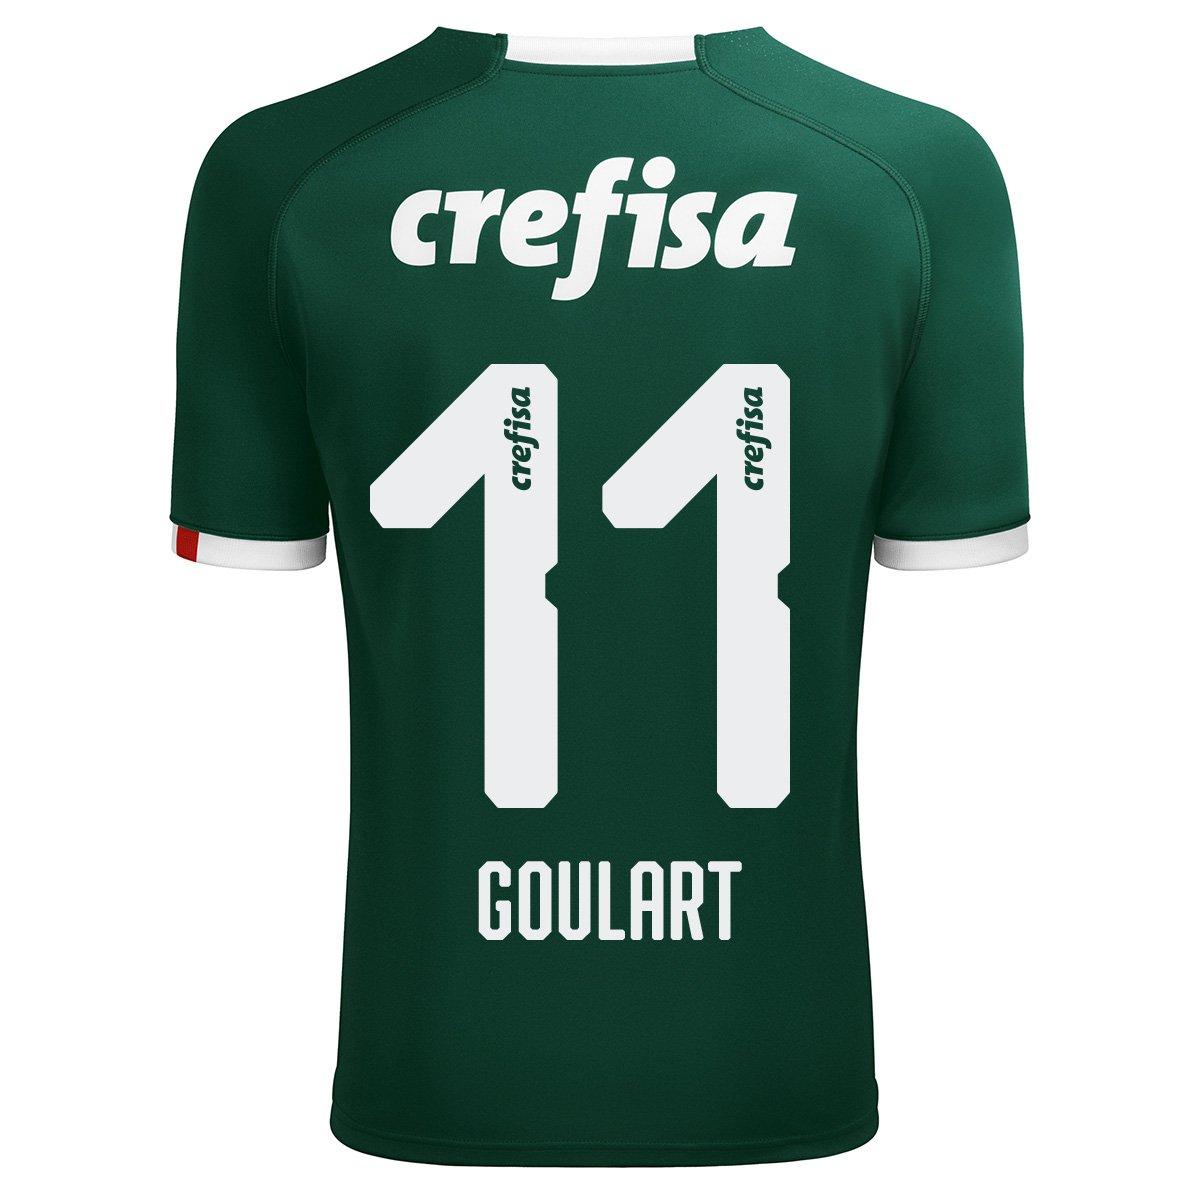 Camisa Palmeiras I 19 20 Goulart nº 11 - Torcedor Puma Masculina ... 0c703d8fe9acc